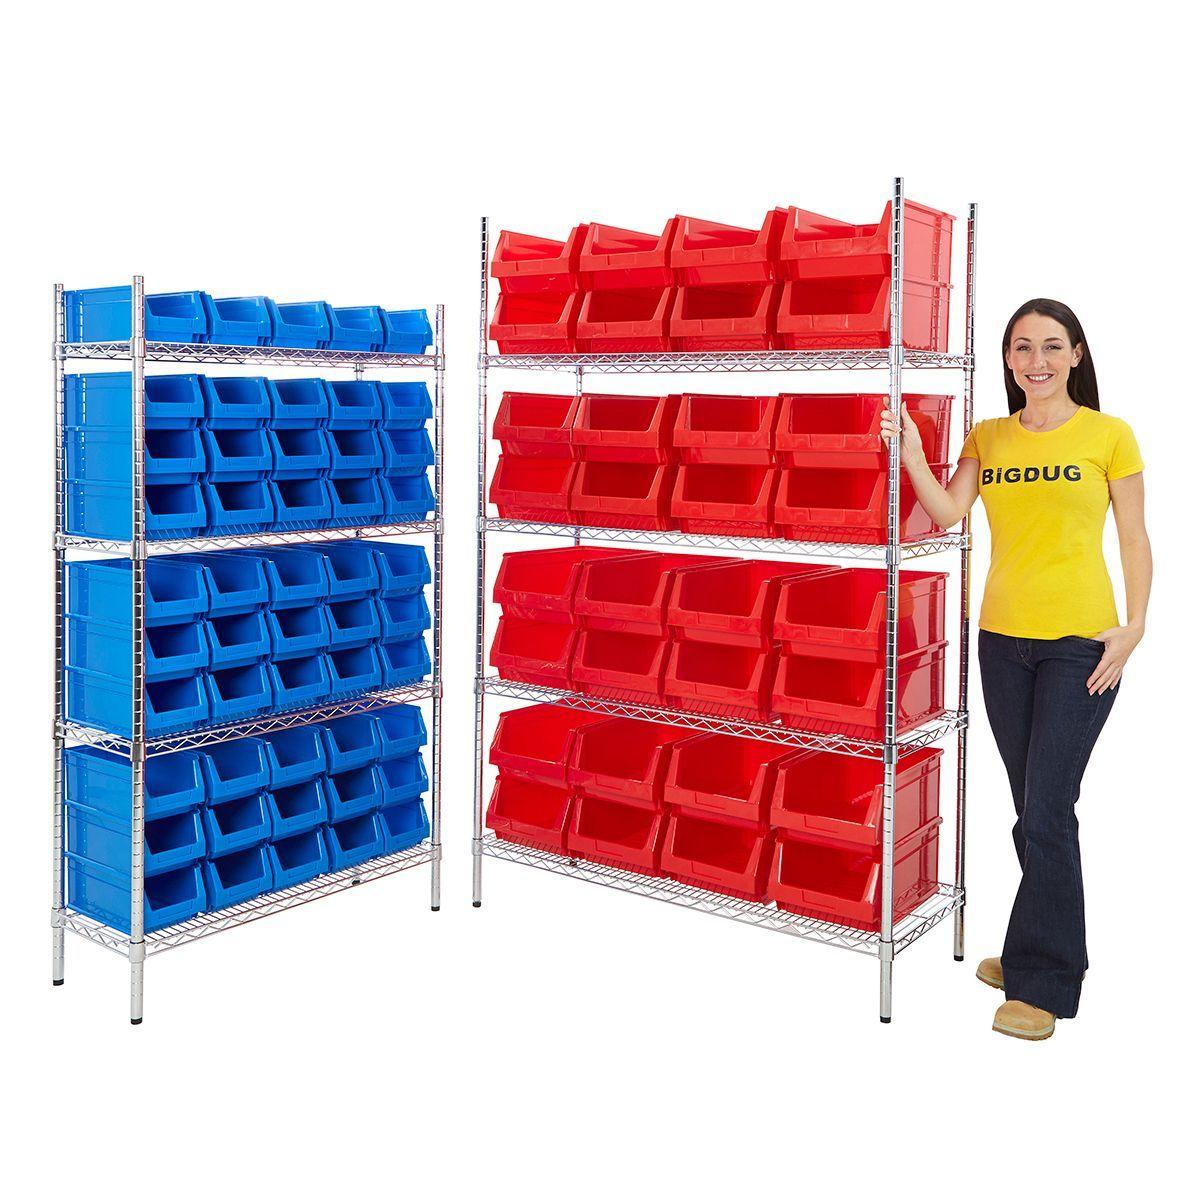 Chrome Shelving Bin Kits - Plastic Parts Bin from BiGDUG UK  sc 1 st  Pinterest & Chrome Shelving Bin Kits - Plastic Parts Bin from BiGDUG UK | Book ...